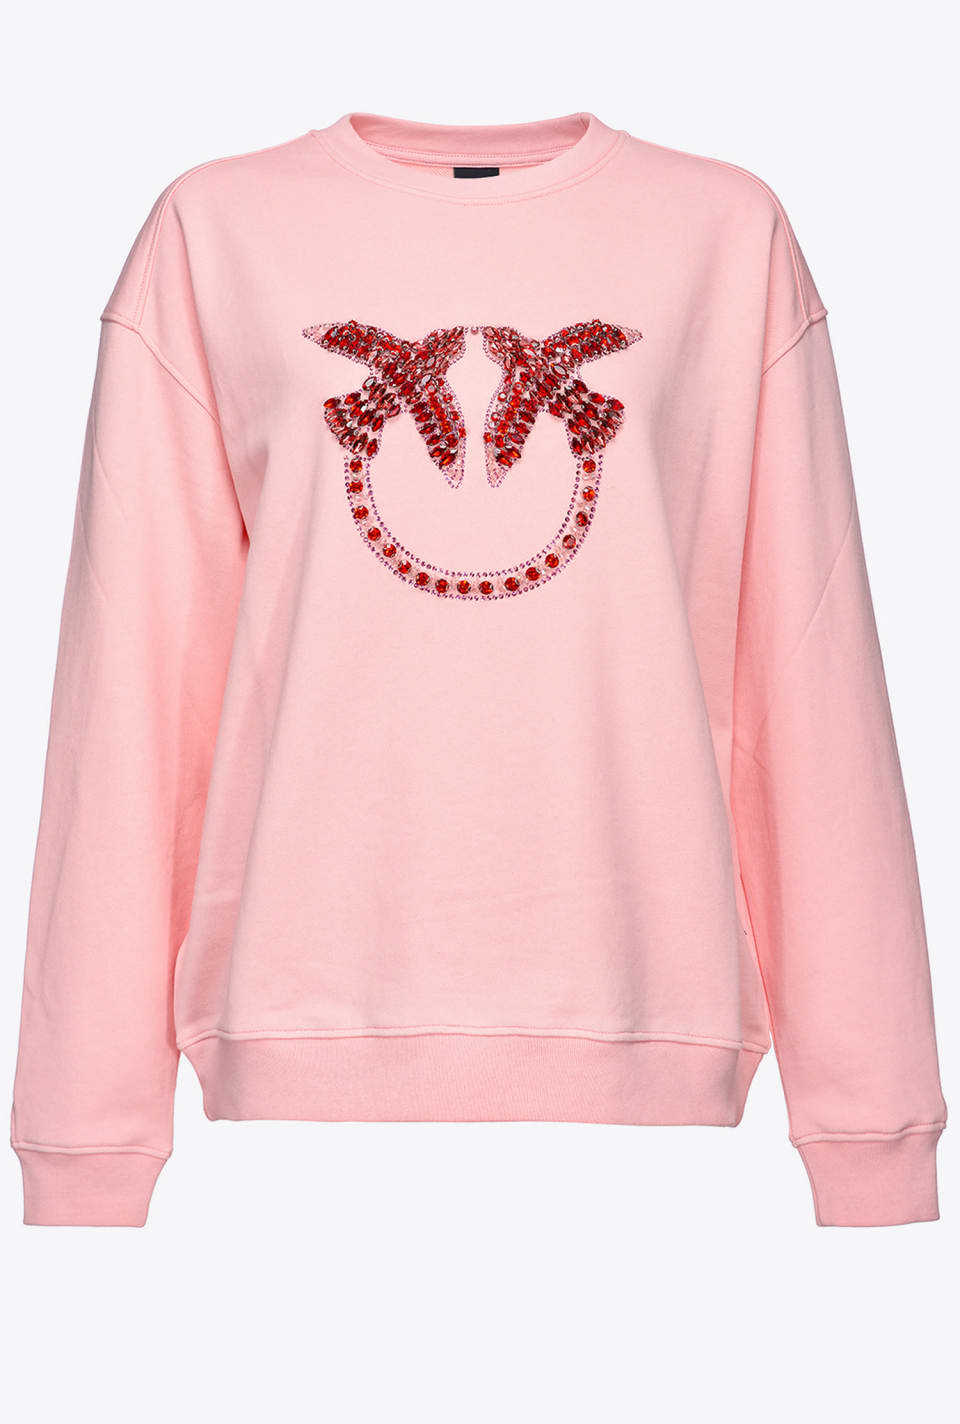 Love Birds embroidery sweatshirt - Pinko